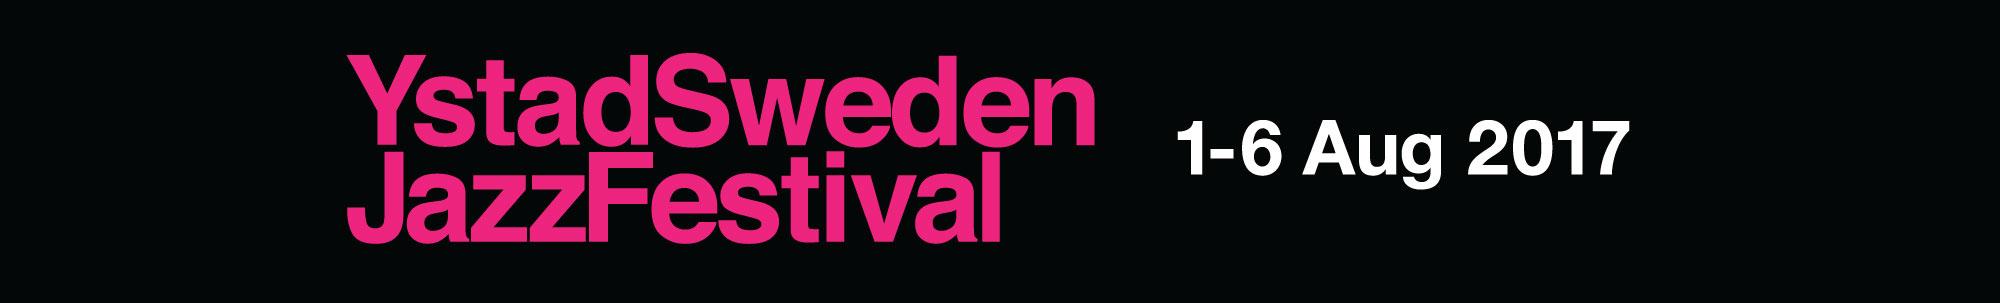 Ystad Sweden Jazz Festival Retina Logo